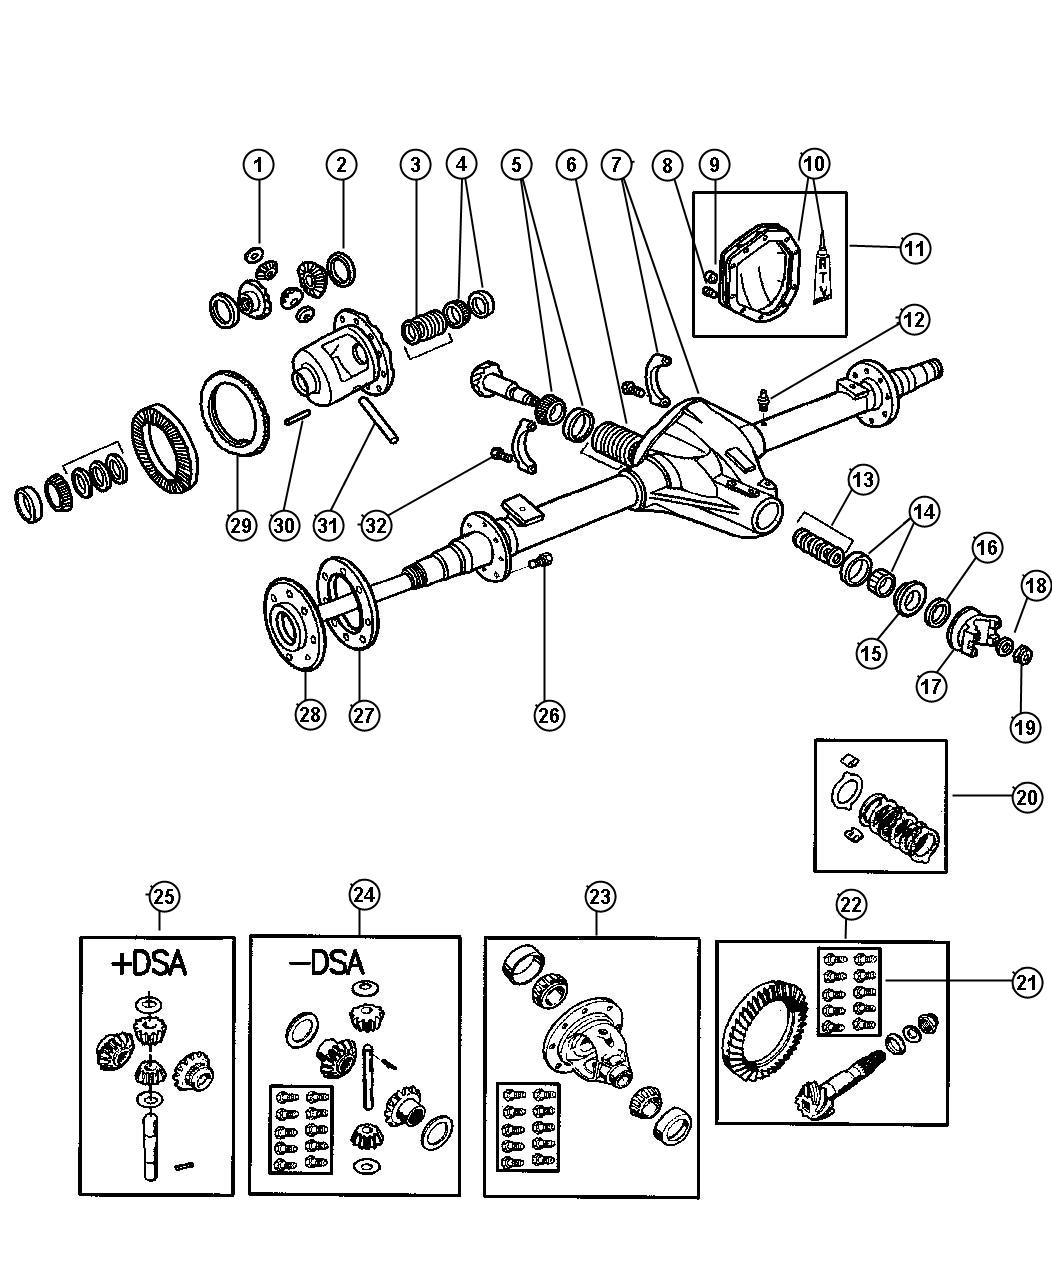 1999 dodge ram 1500 front axle diagram chevrolet alternator wiring imageresizertool com